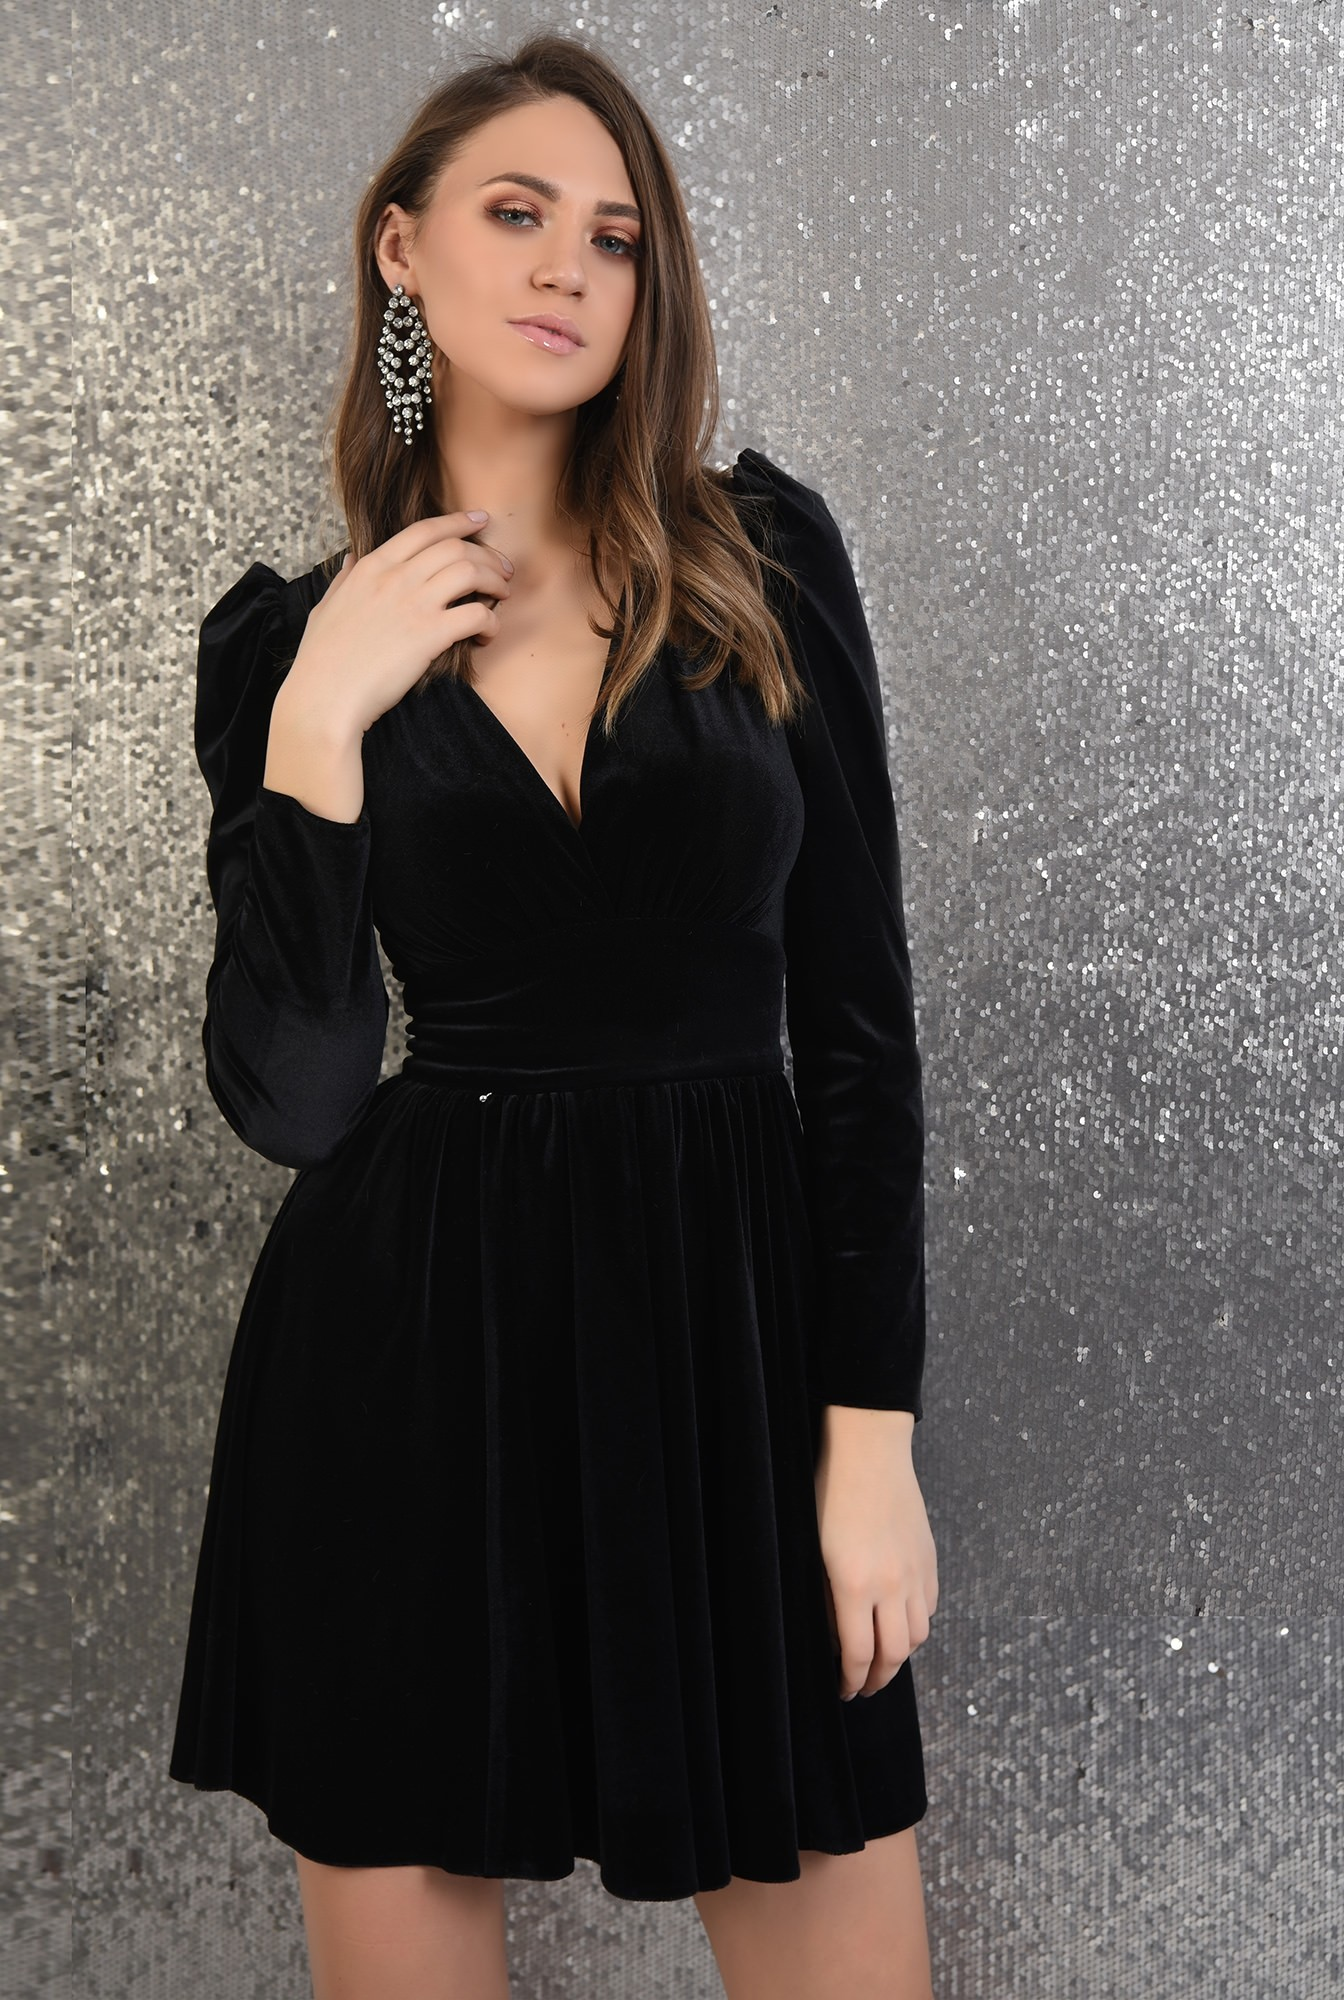 2 - rochie neagra, din catifea, clos, maneci lungi, decolteu in V